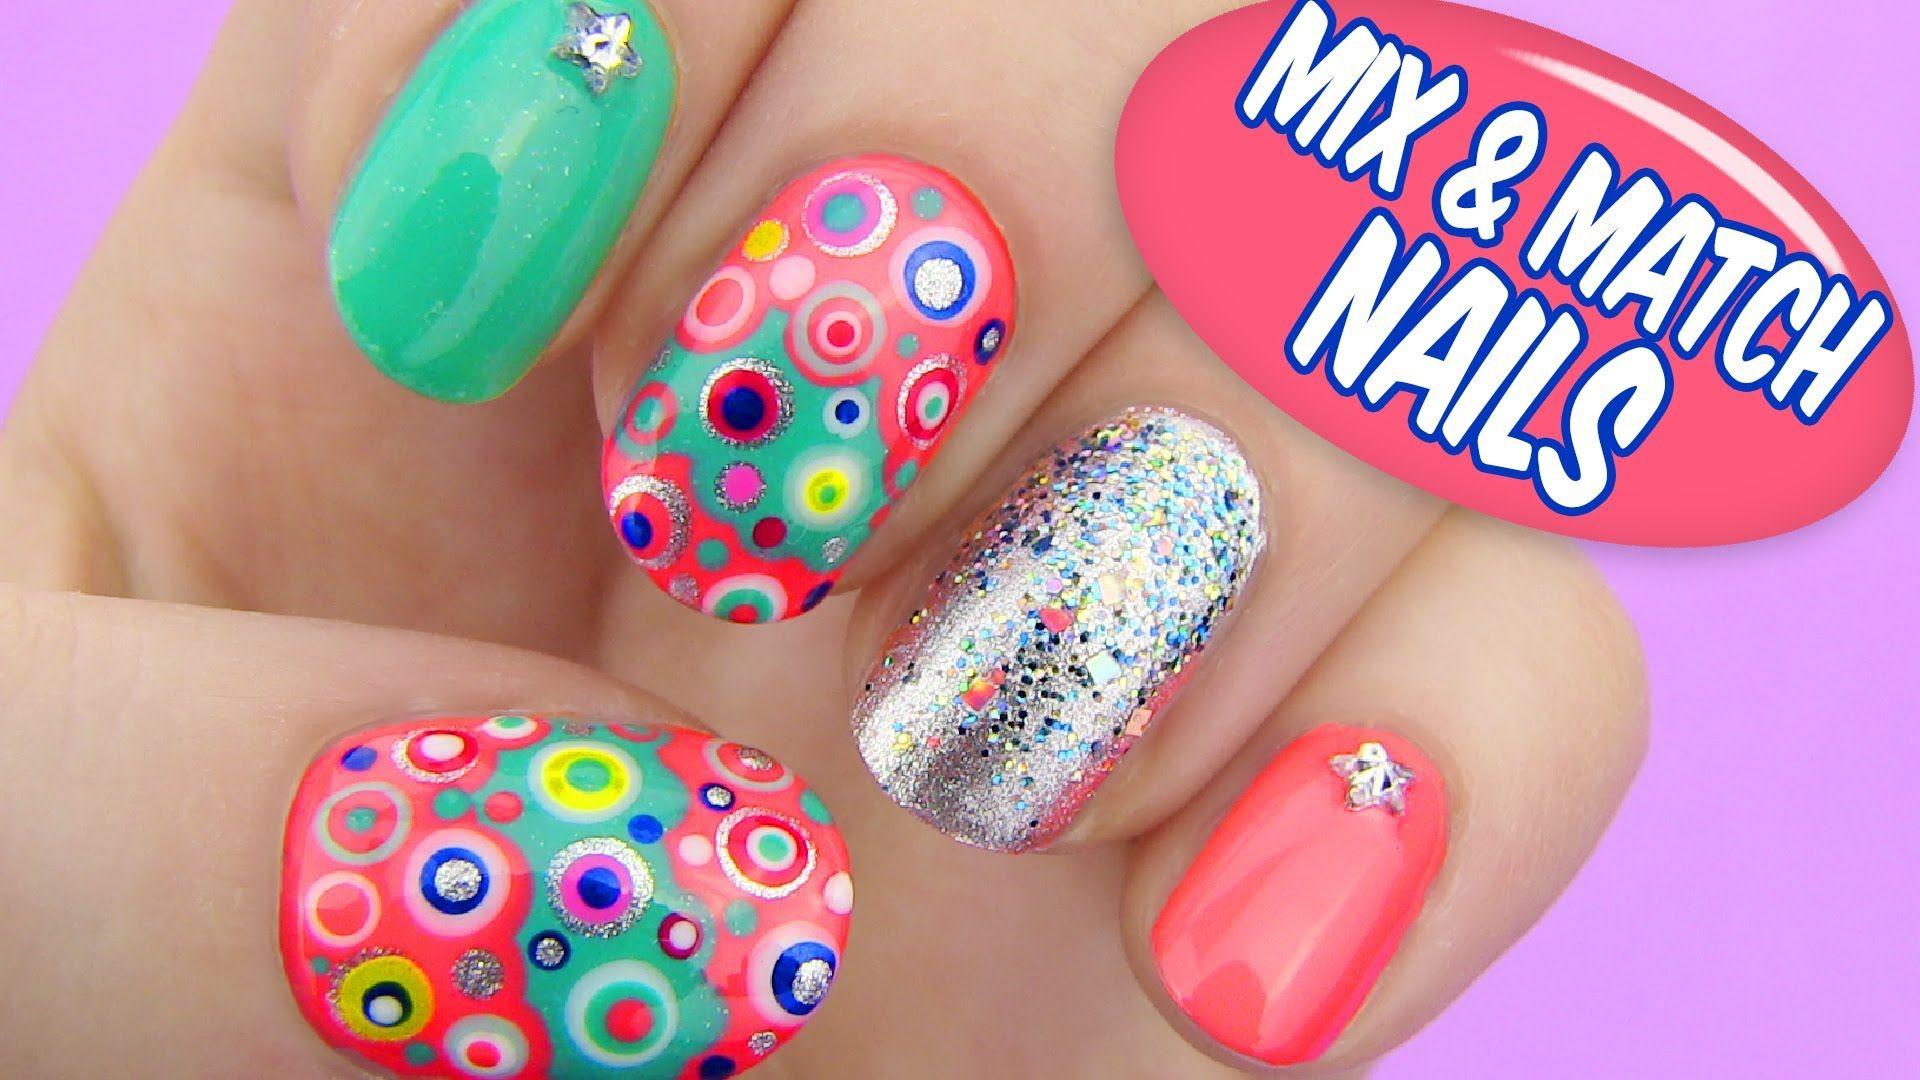 Mix And Match Nails Nail Art Using Dotting Tools Q Tip Few Nail